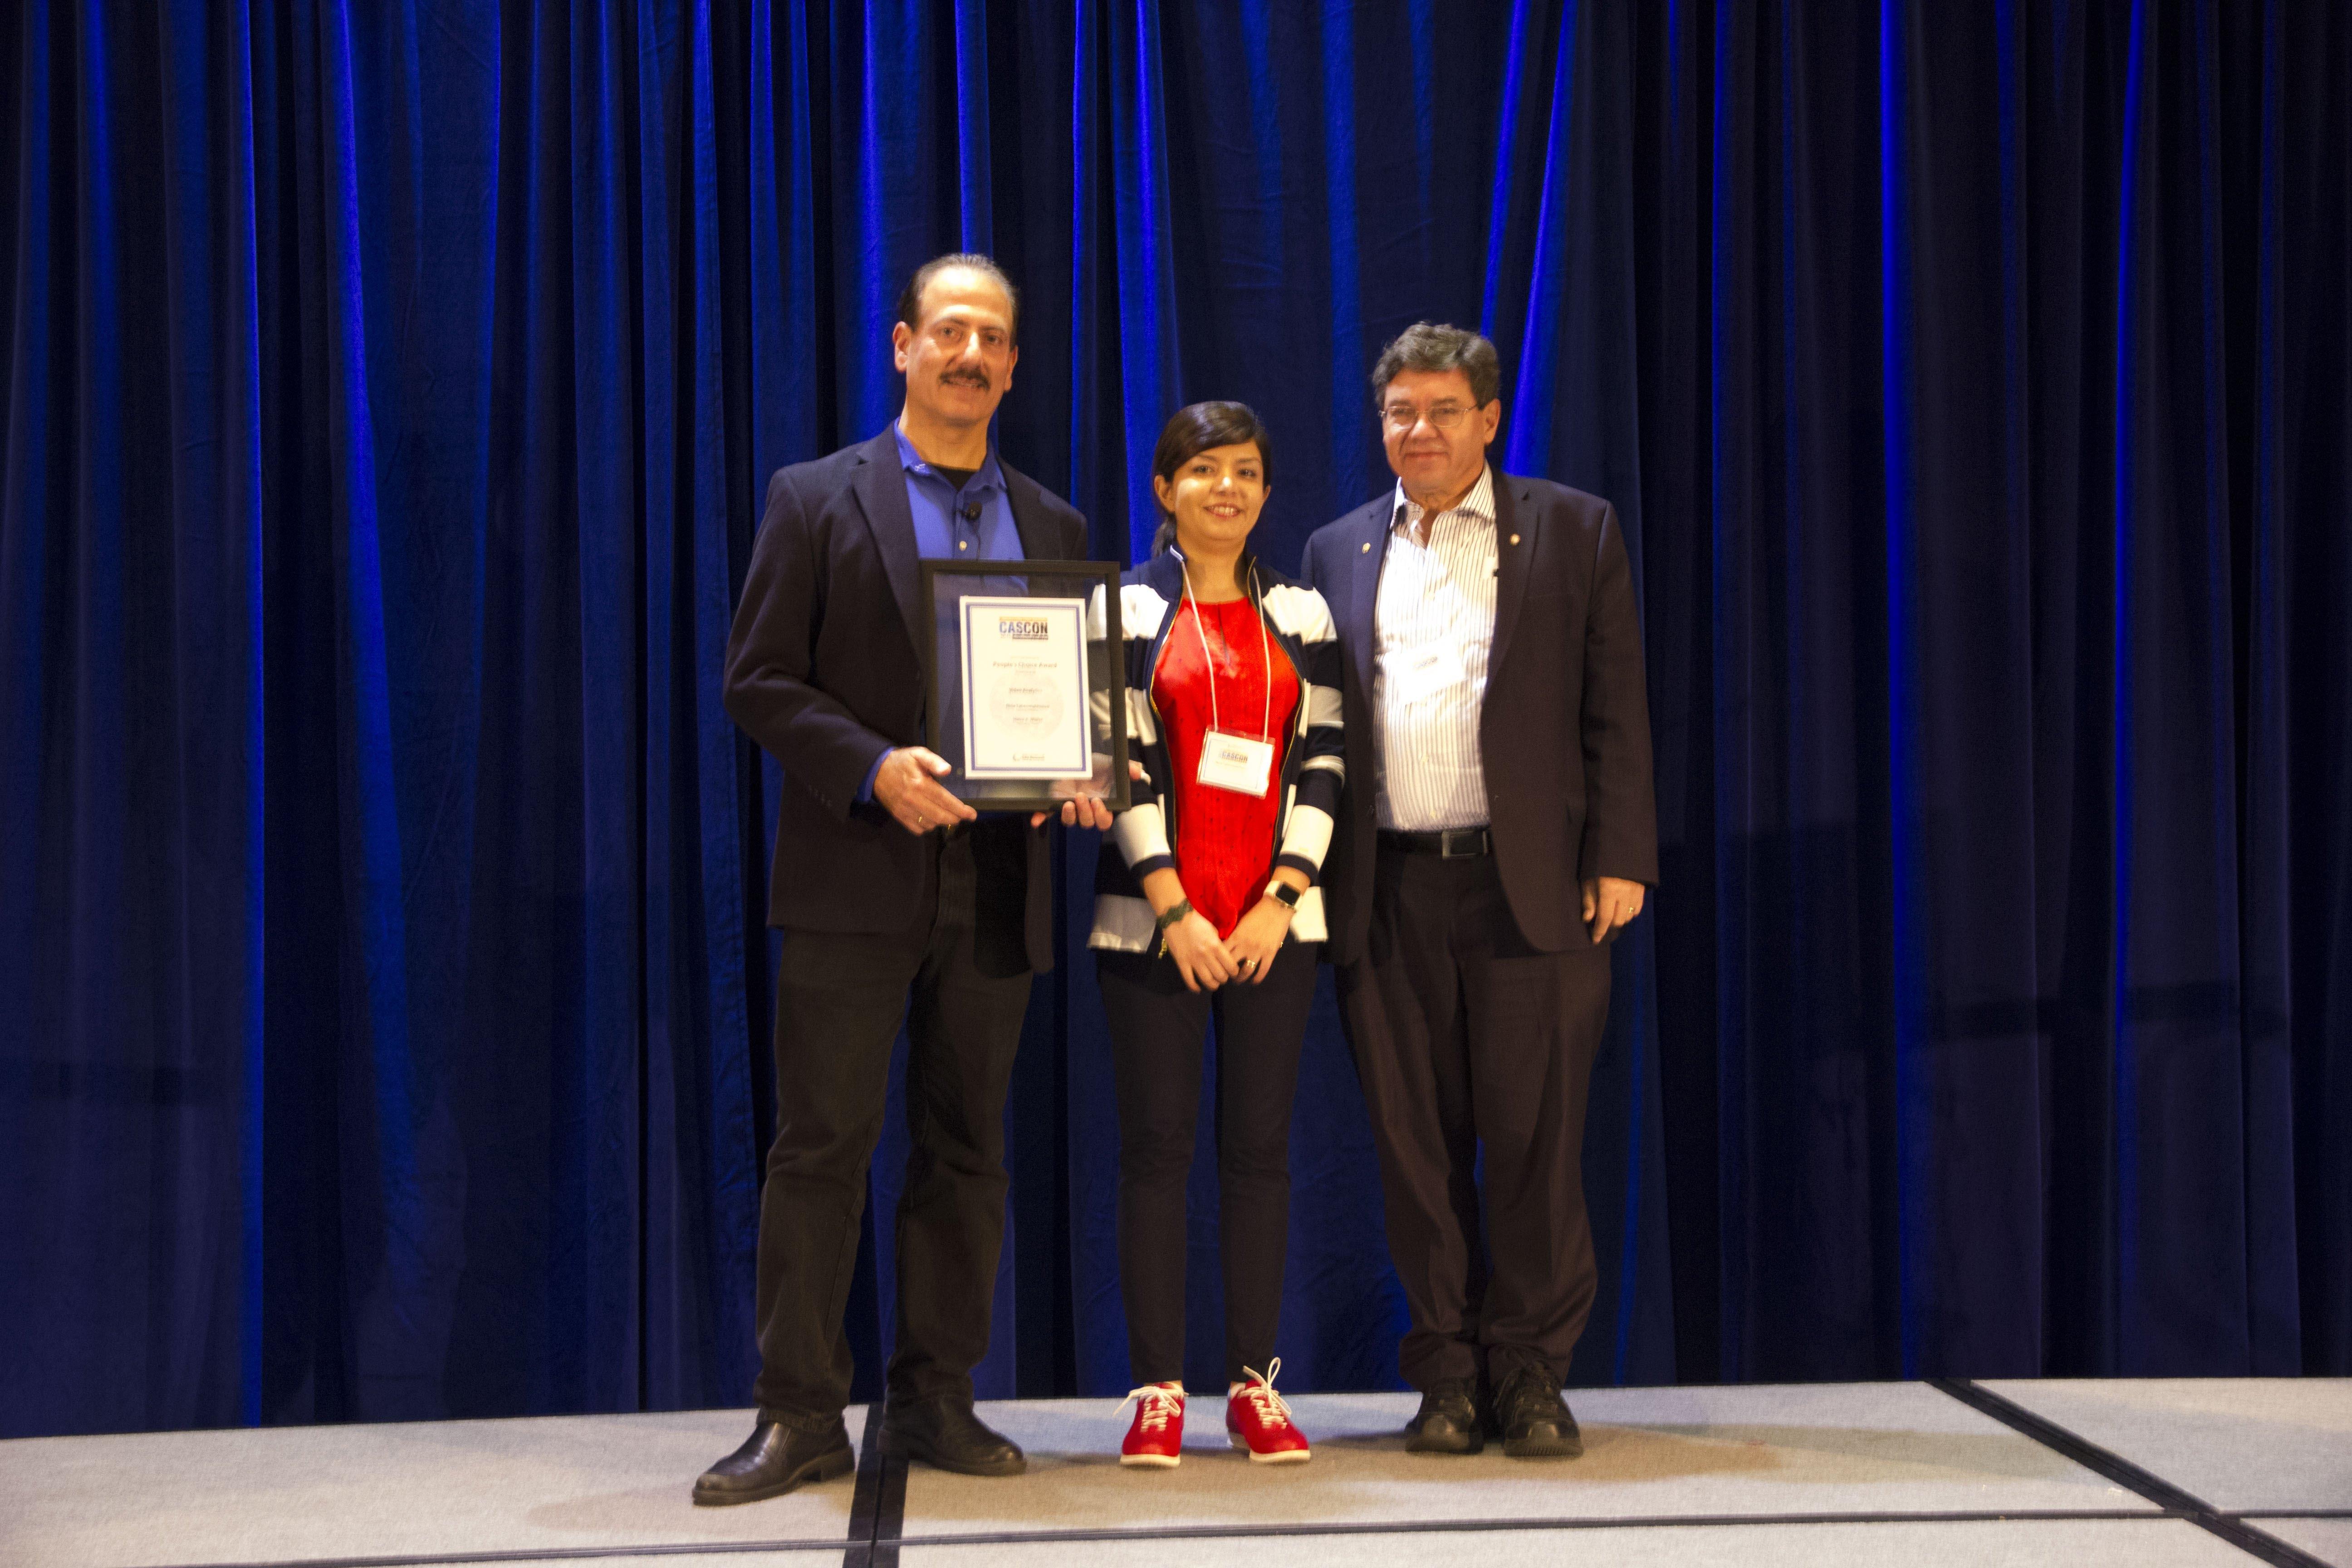 People's Choice Technology Showcase Award